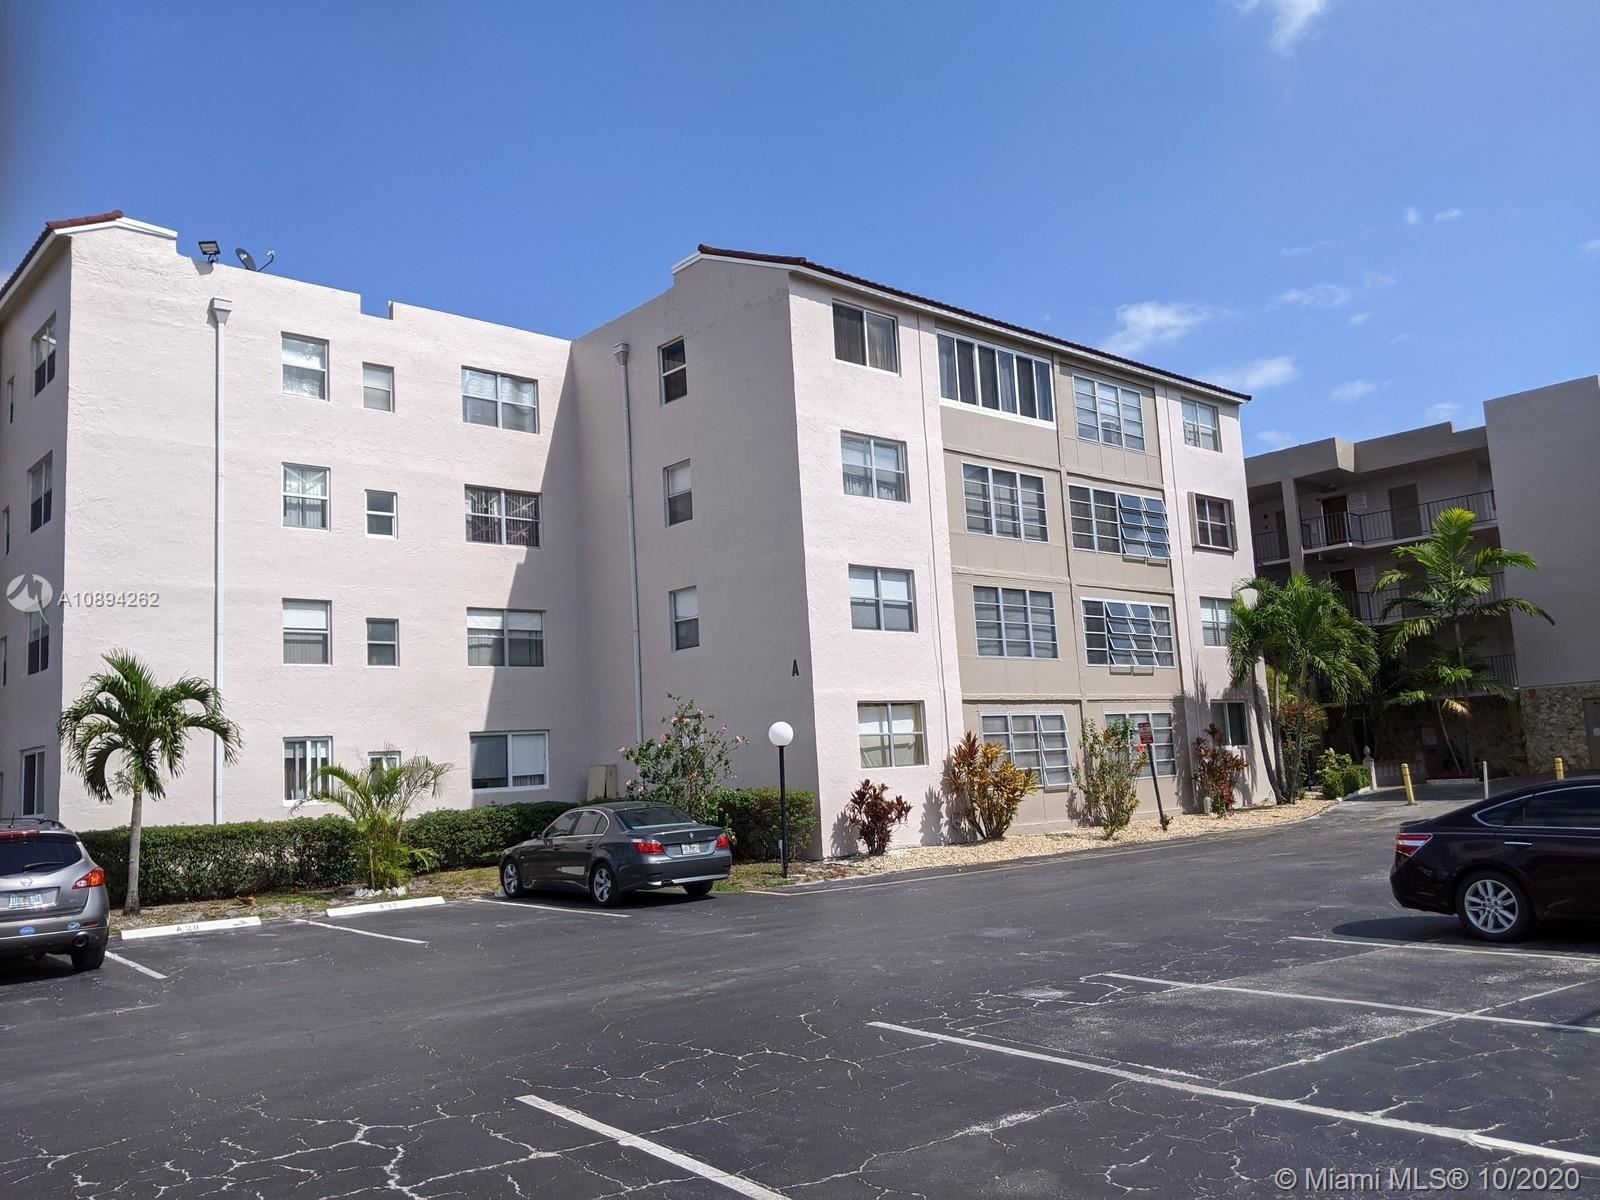 2821 Somerset Dr #302, Lauderdale Lakes, FL 33311 - #: A10894262